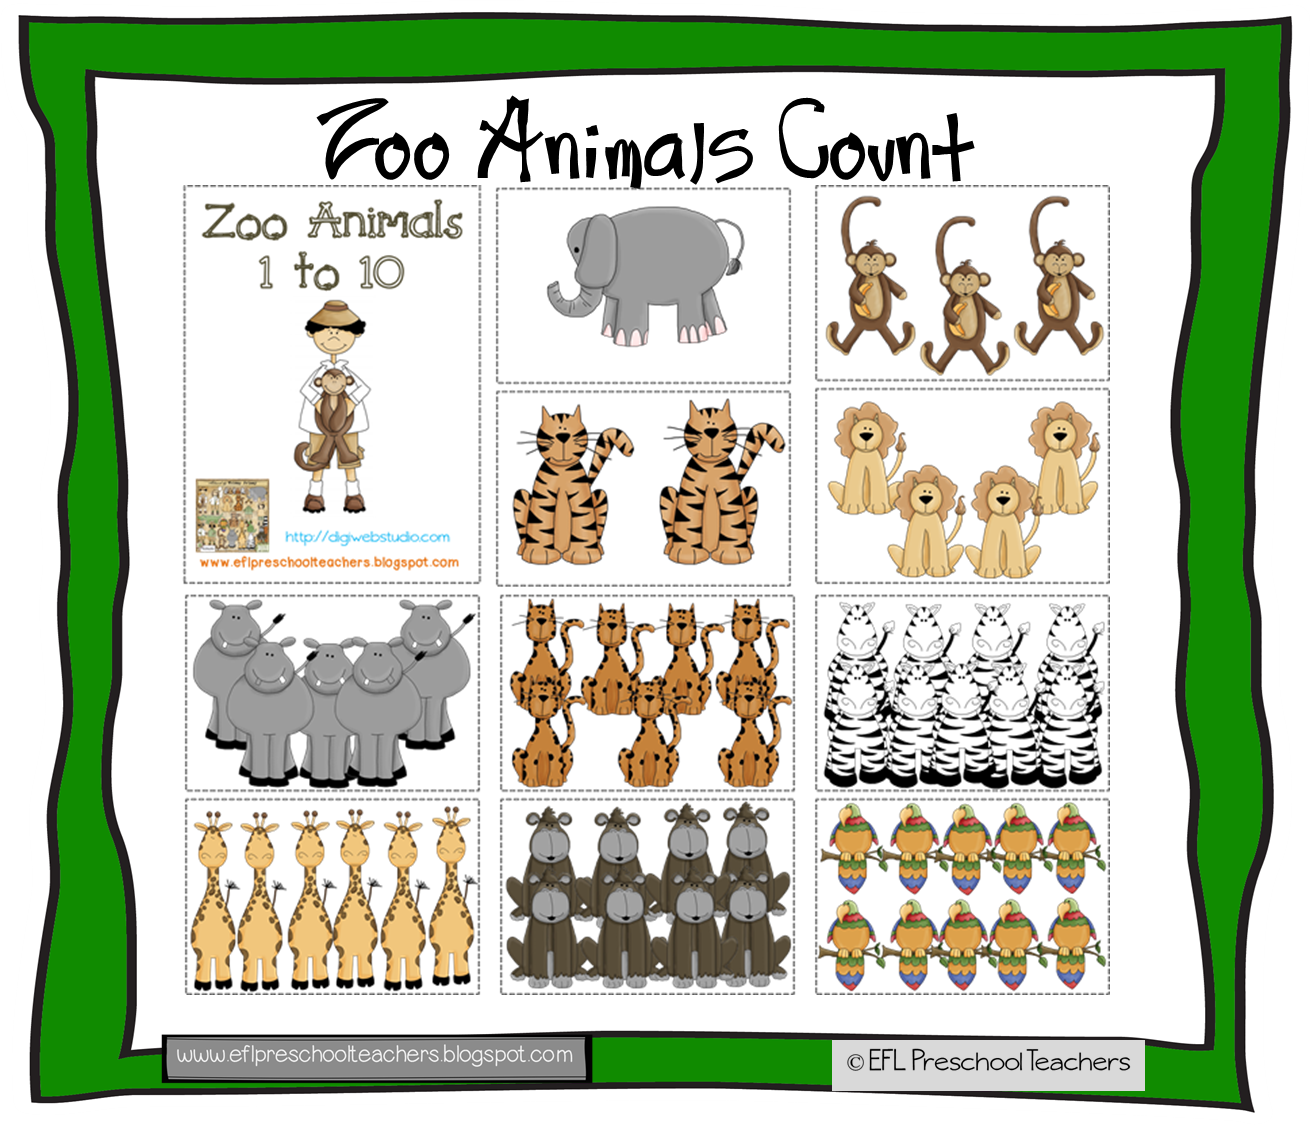 Esl Efl Preschool Teachers Zoo Or Jungle Theme For The